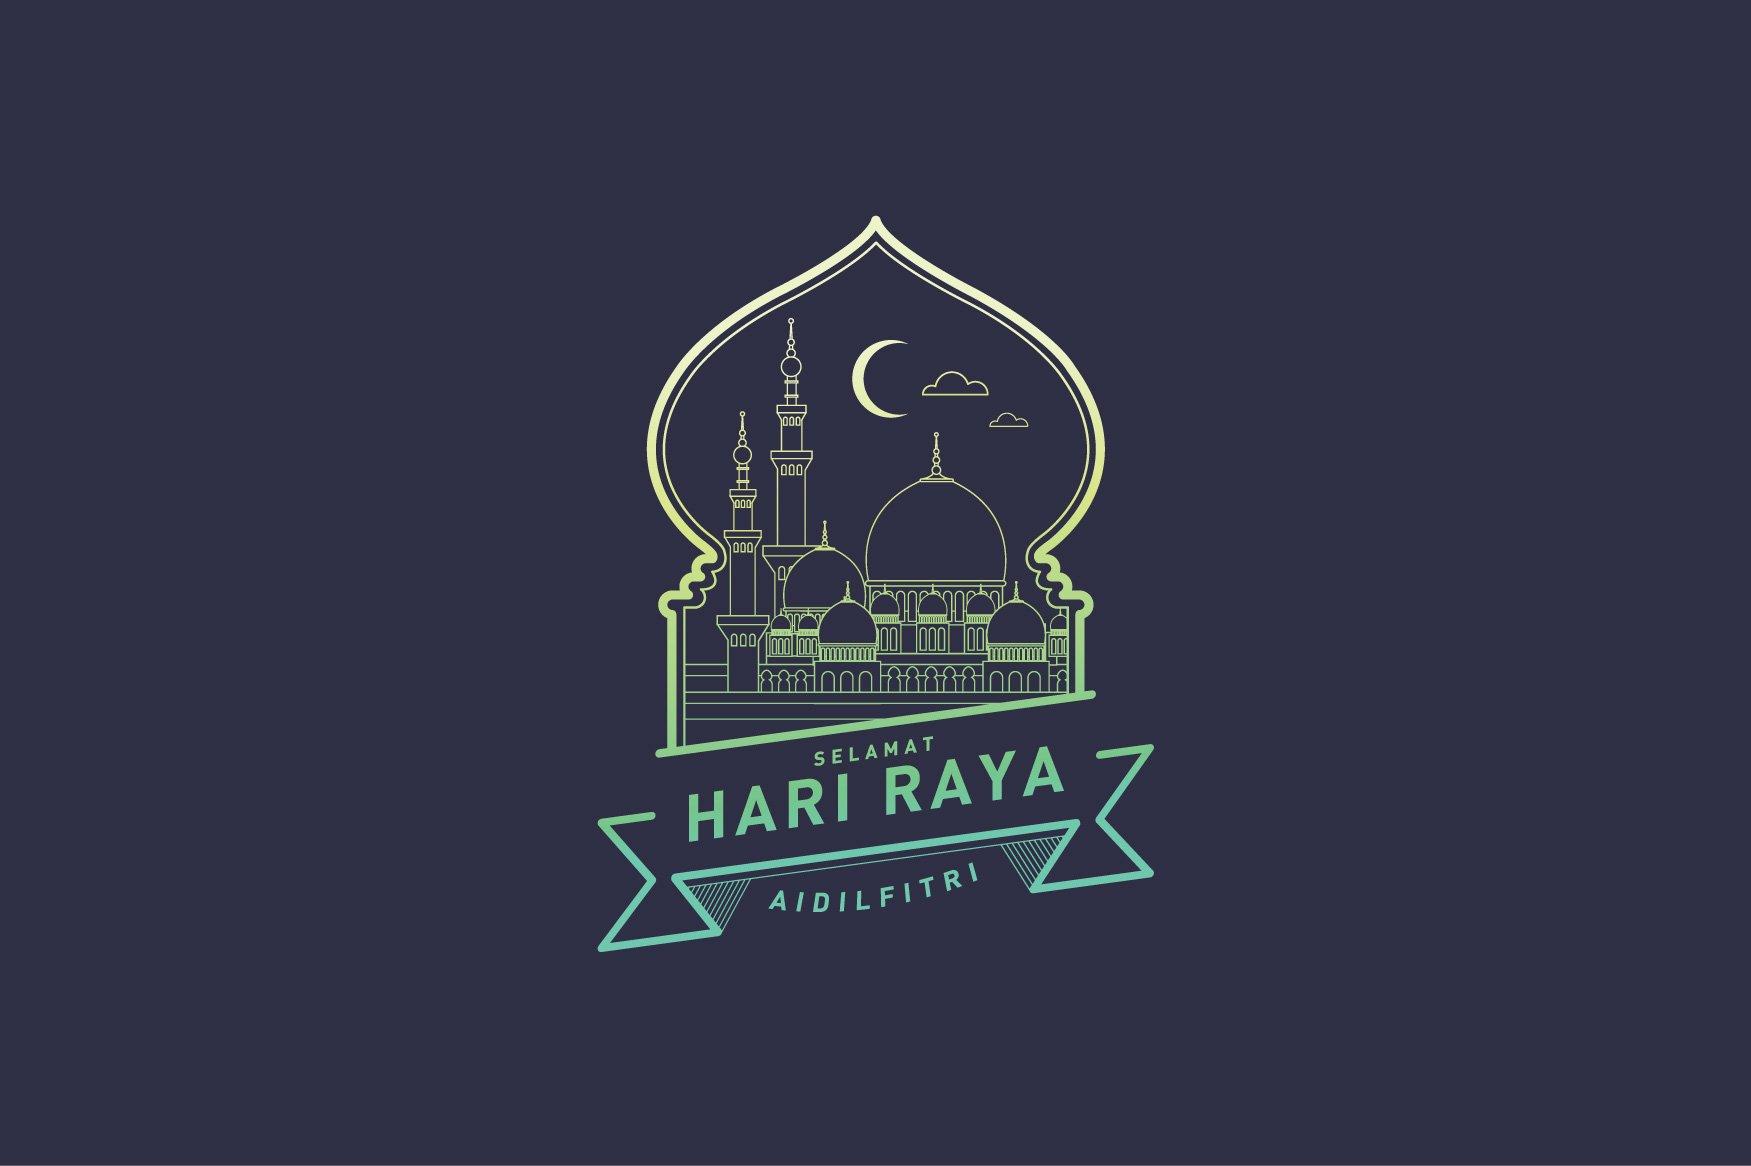 Hari raya greetings template vector illustrations creative market kristyandbryce Image collections